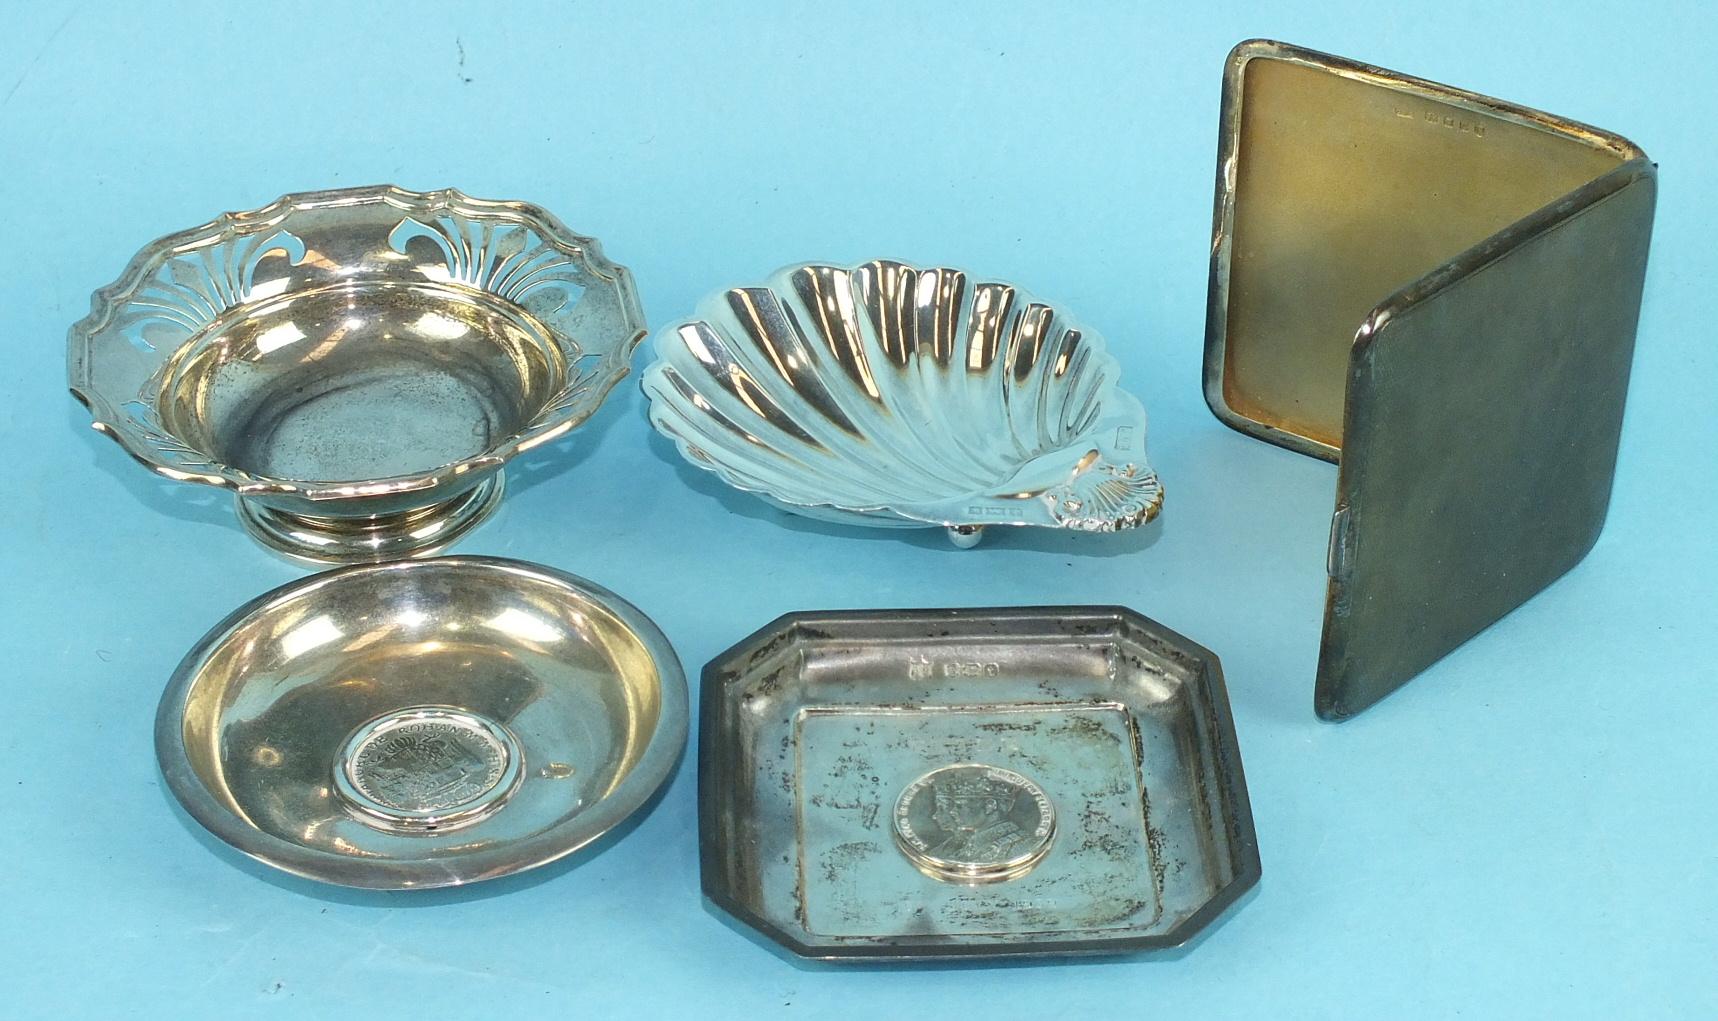 Lot 469 - A silver cigarette case, 8cm square, London 1935, a modern silver shell-shaped dish, 10cm, 1971, a